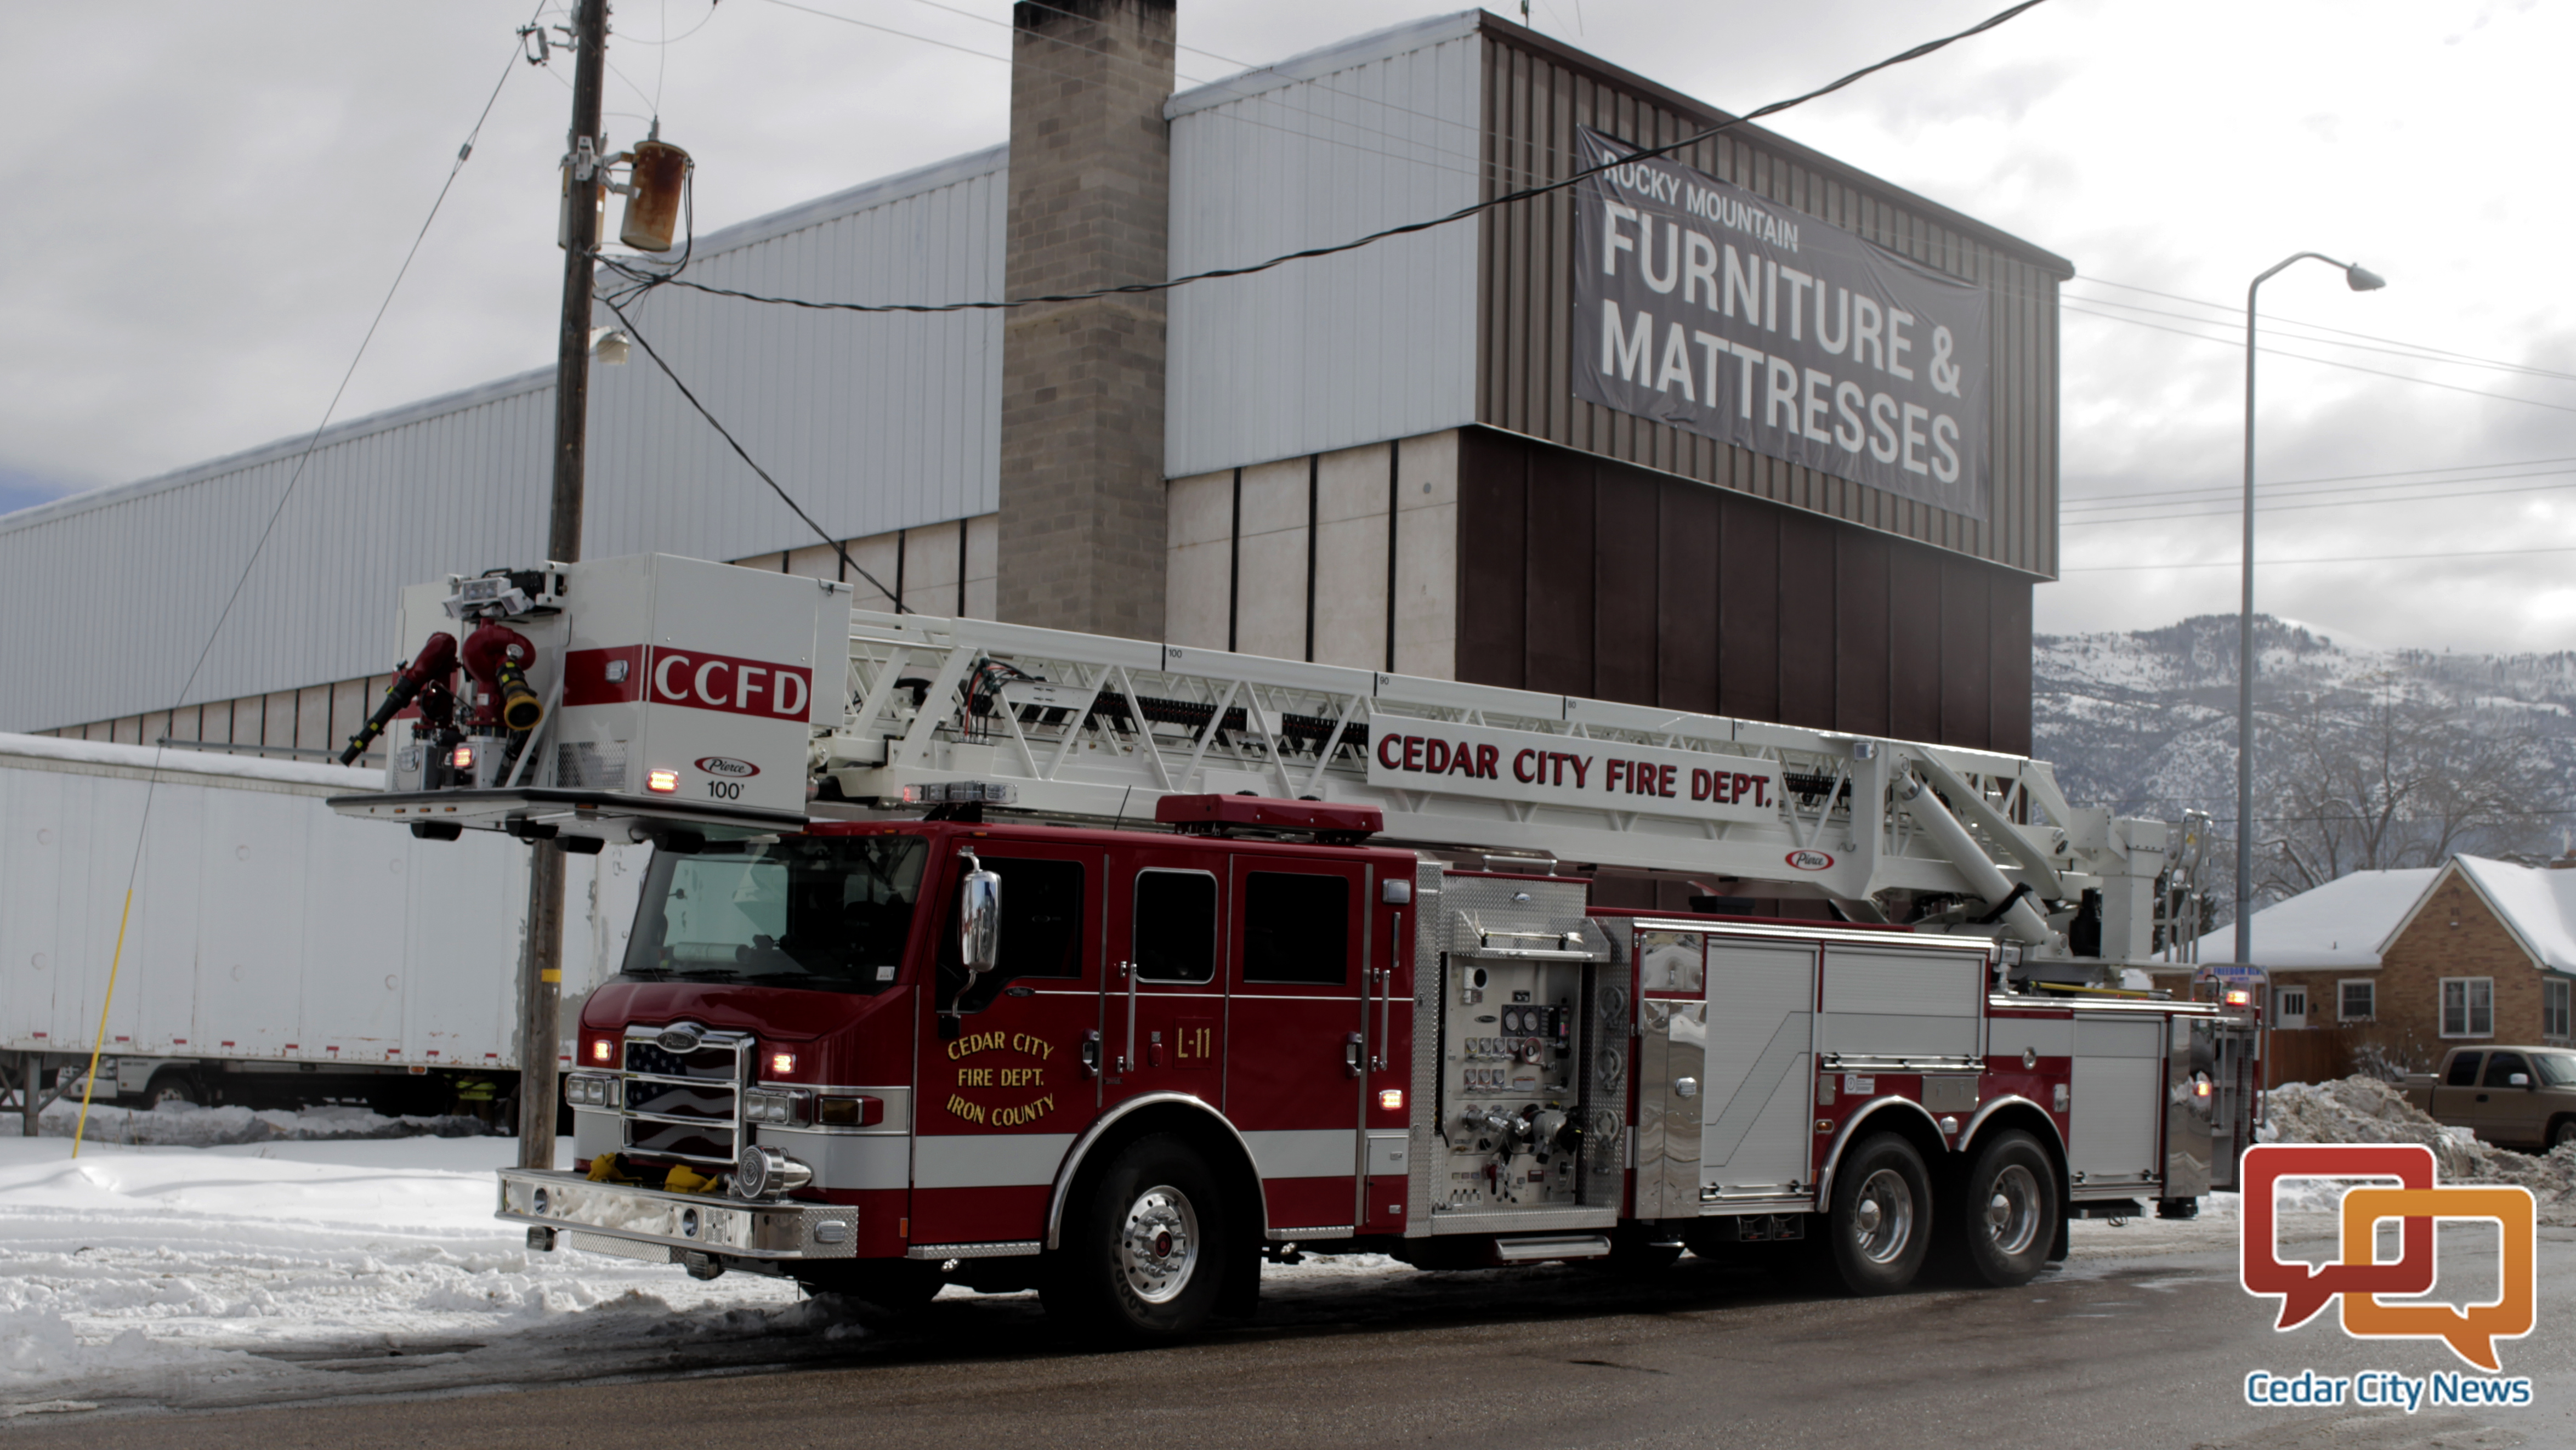 New Fire Procedures Help Save Cedar City Furniture Store